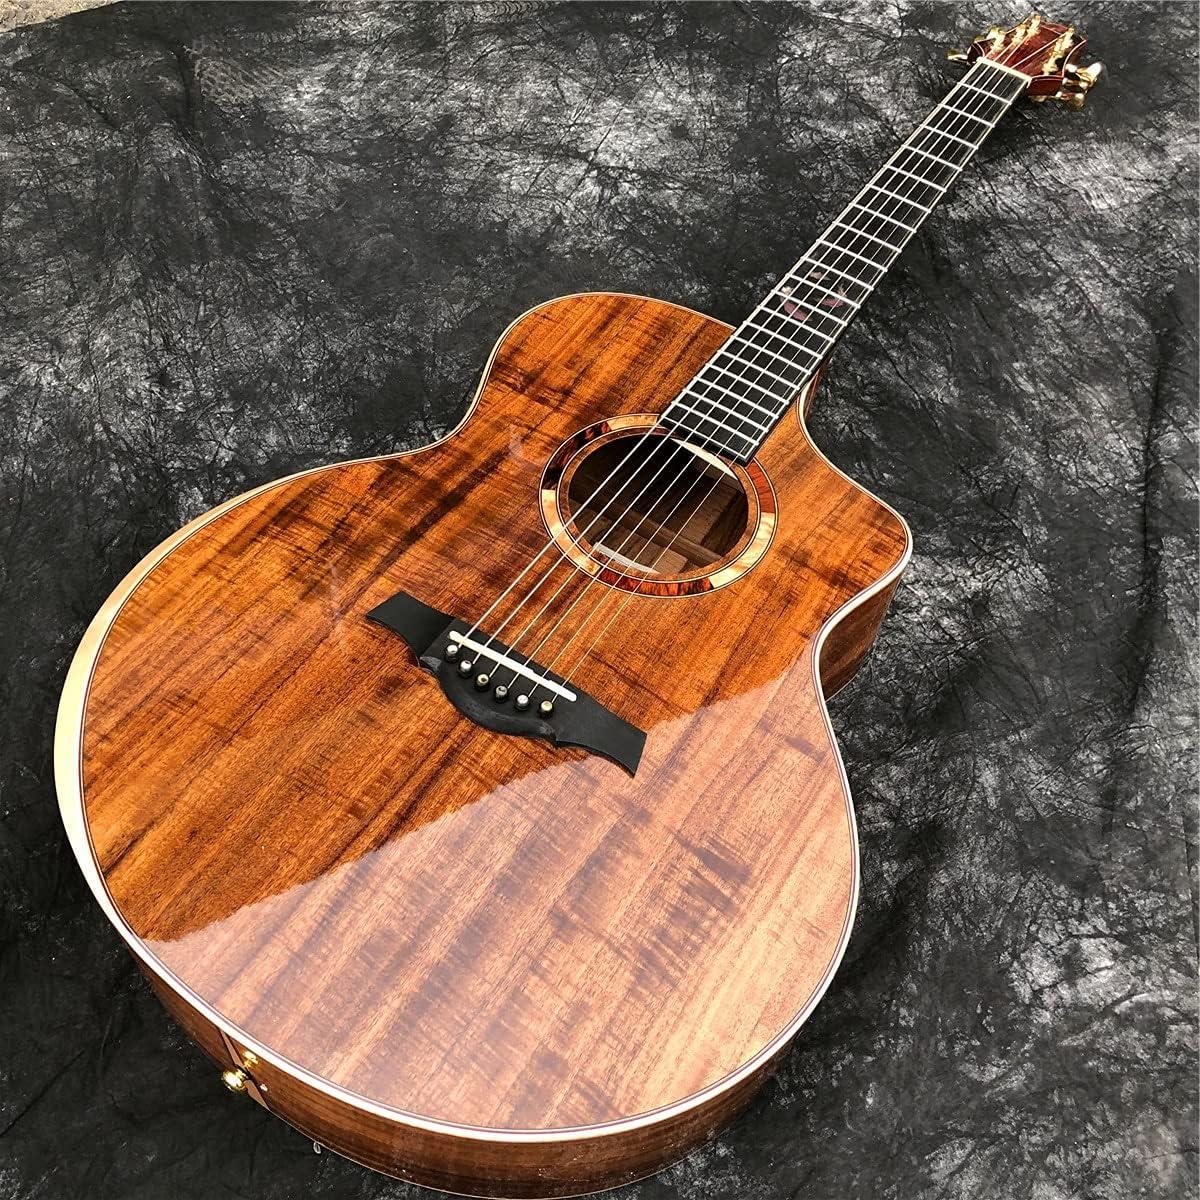 Guitarra All Solid Wood 41 Pulgadas Cortaway Acústico Instrumentos Guitarmusicos Acústica Guitarra Kitsacústica Steel-String Guitars Guitarra de Madera AMINÍ